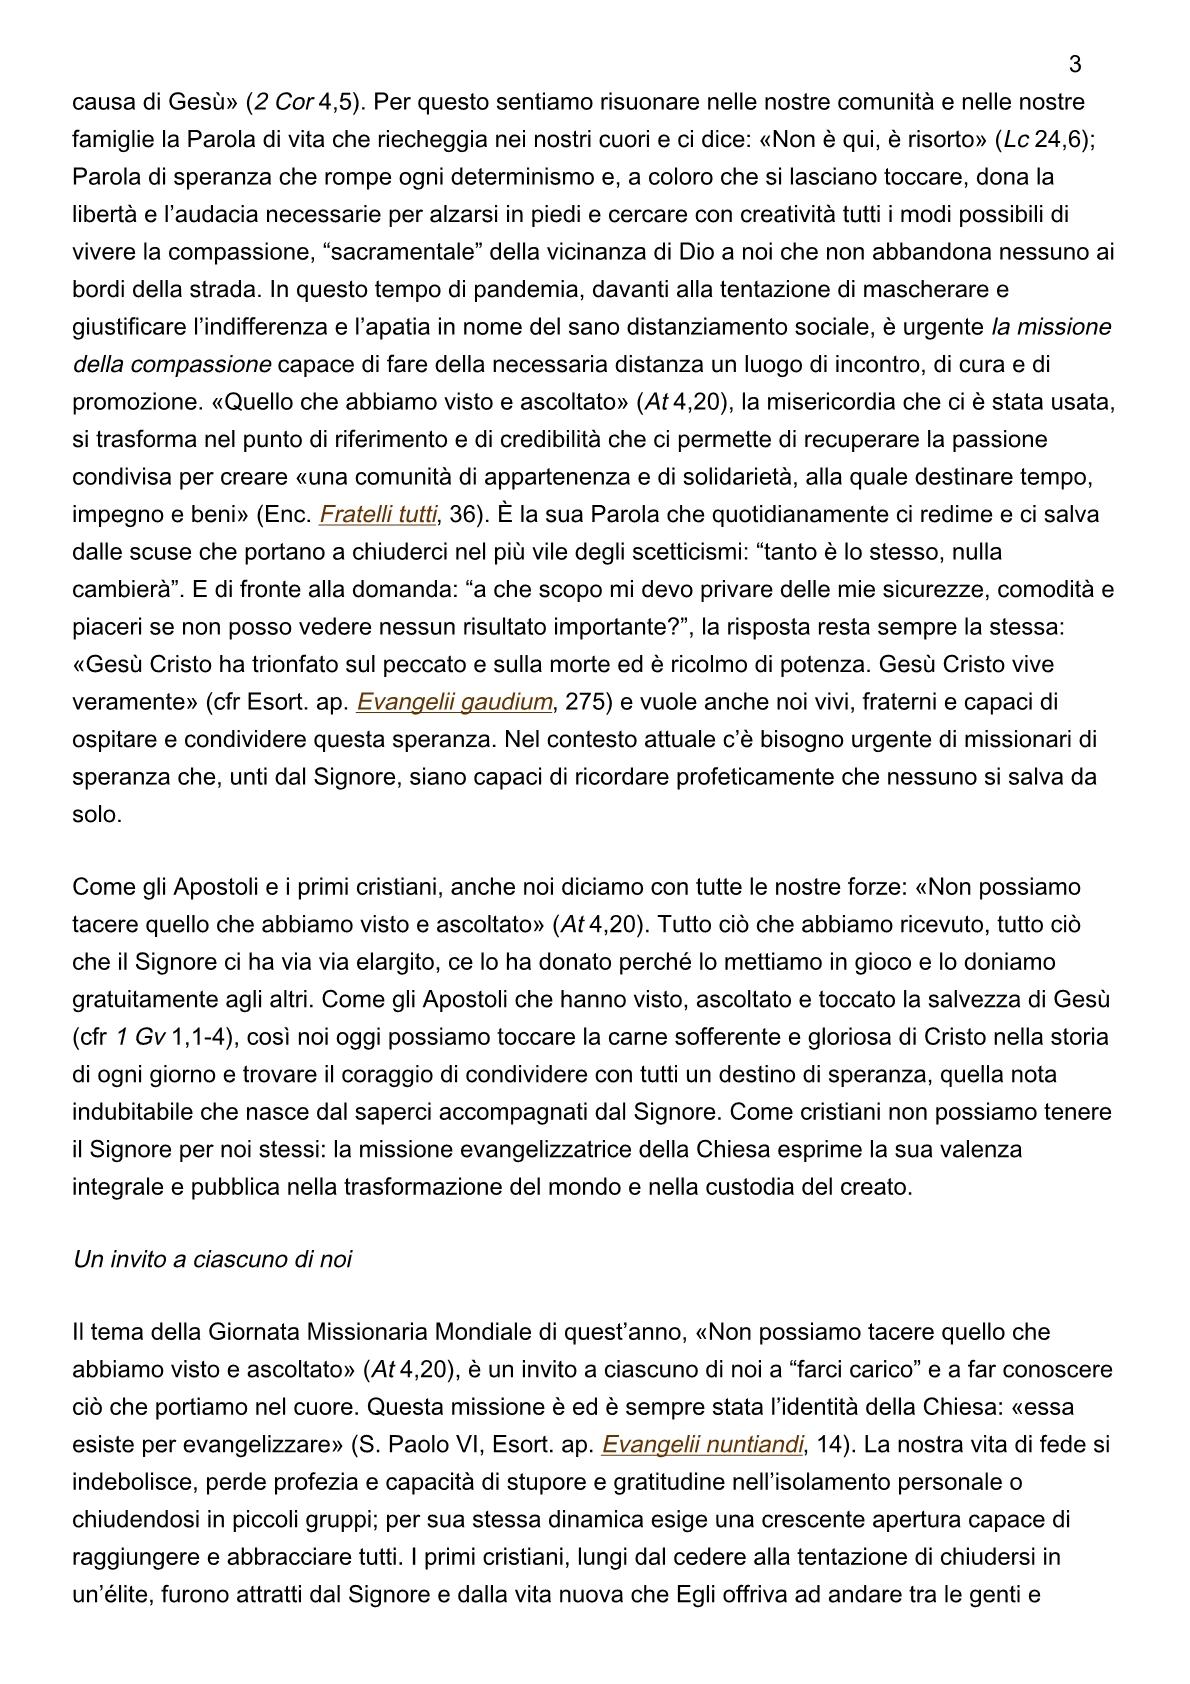 papa-francesco_20210106_giornata-missionaria20213